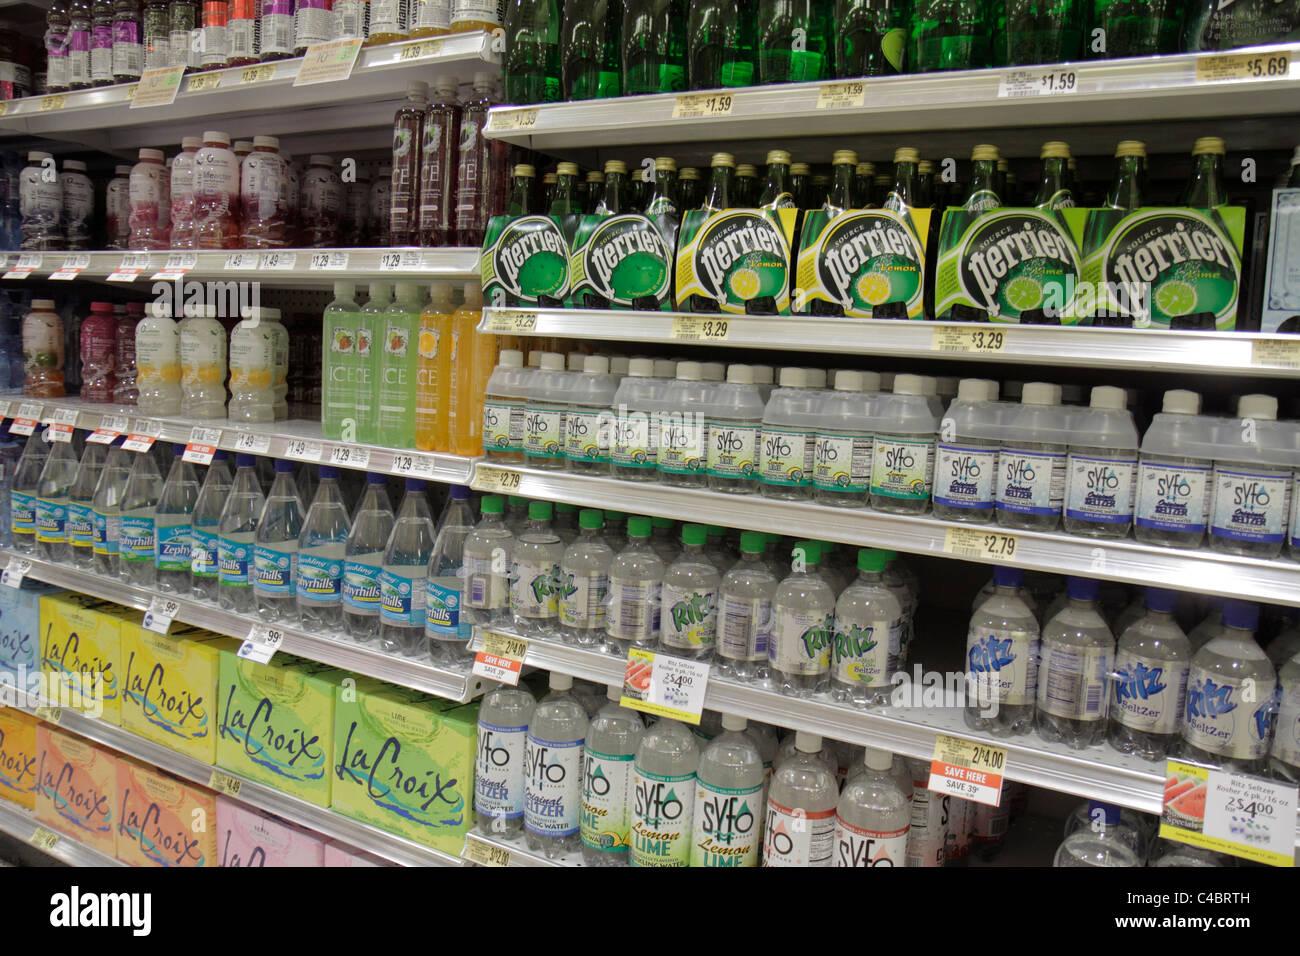 Ocala Florida Publix grocery store supermarket retail display packaging competing brands bottled water shelf shelves - Stock Image